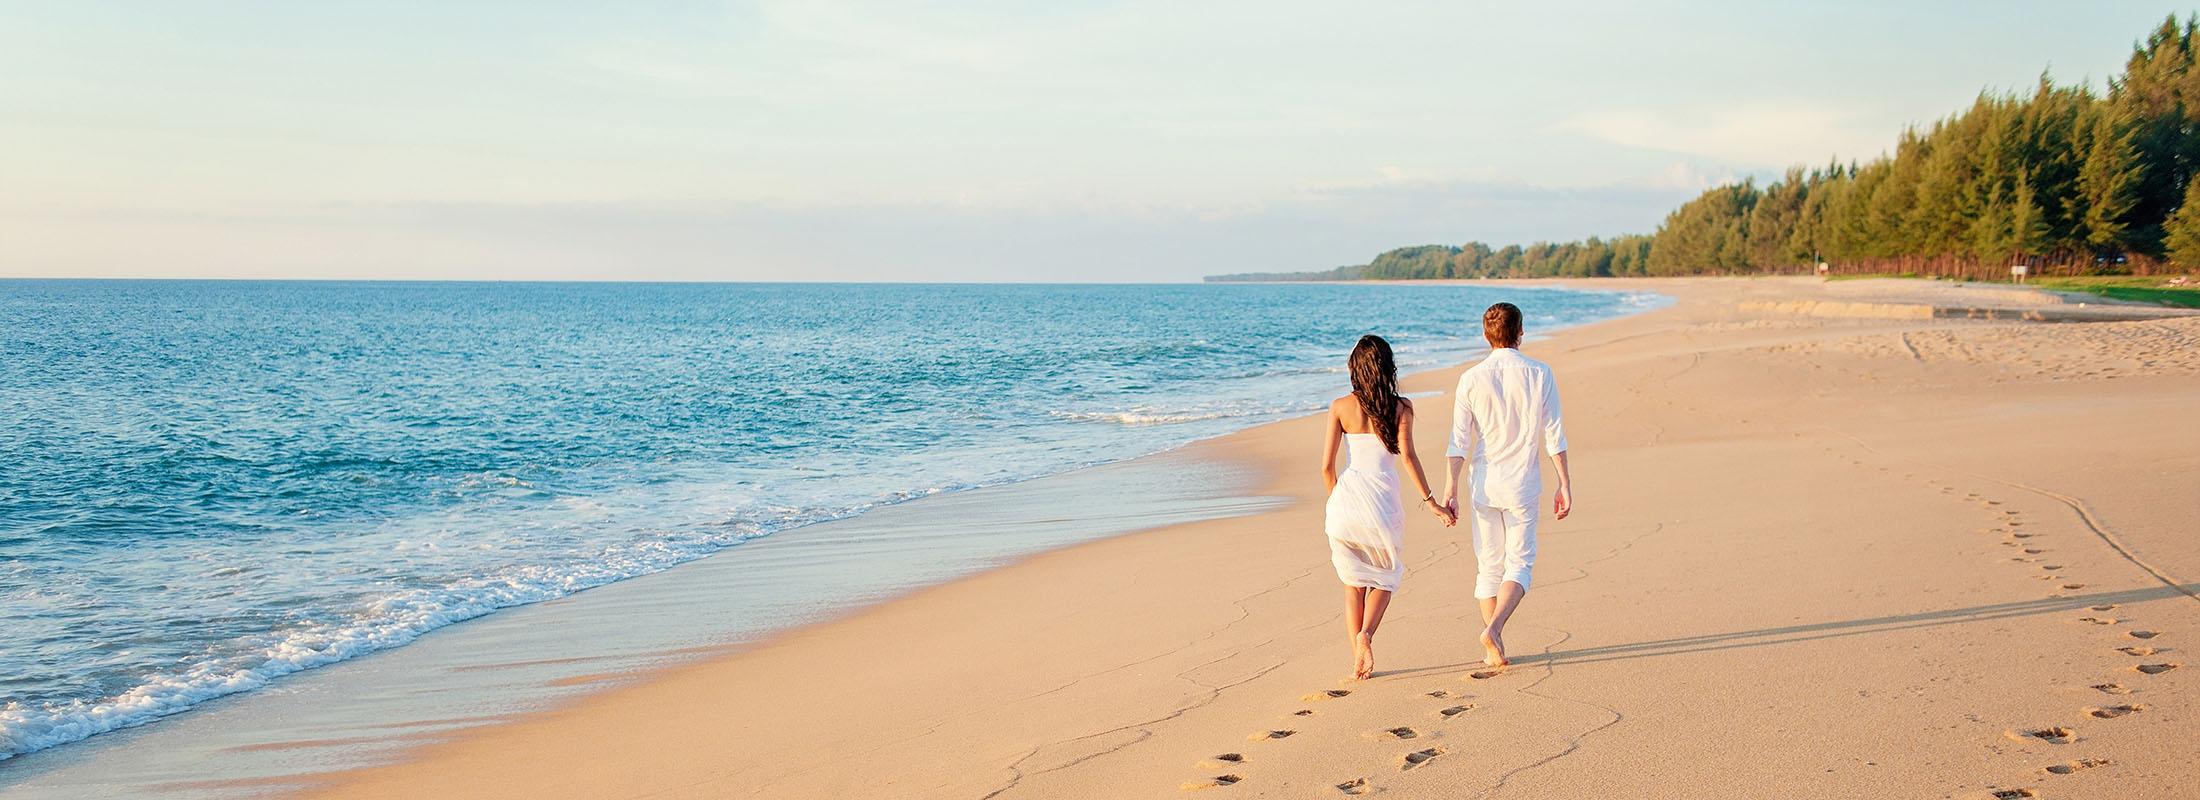 Oman Travel Agencies | Arabia Weddings